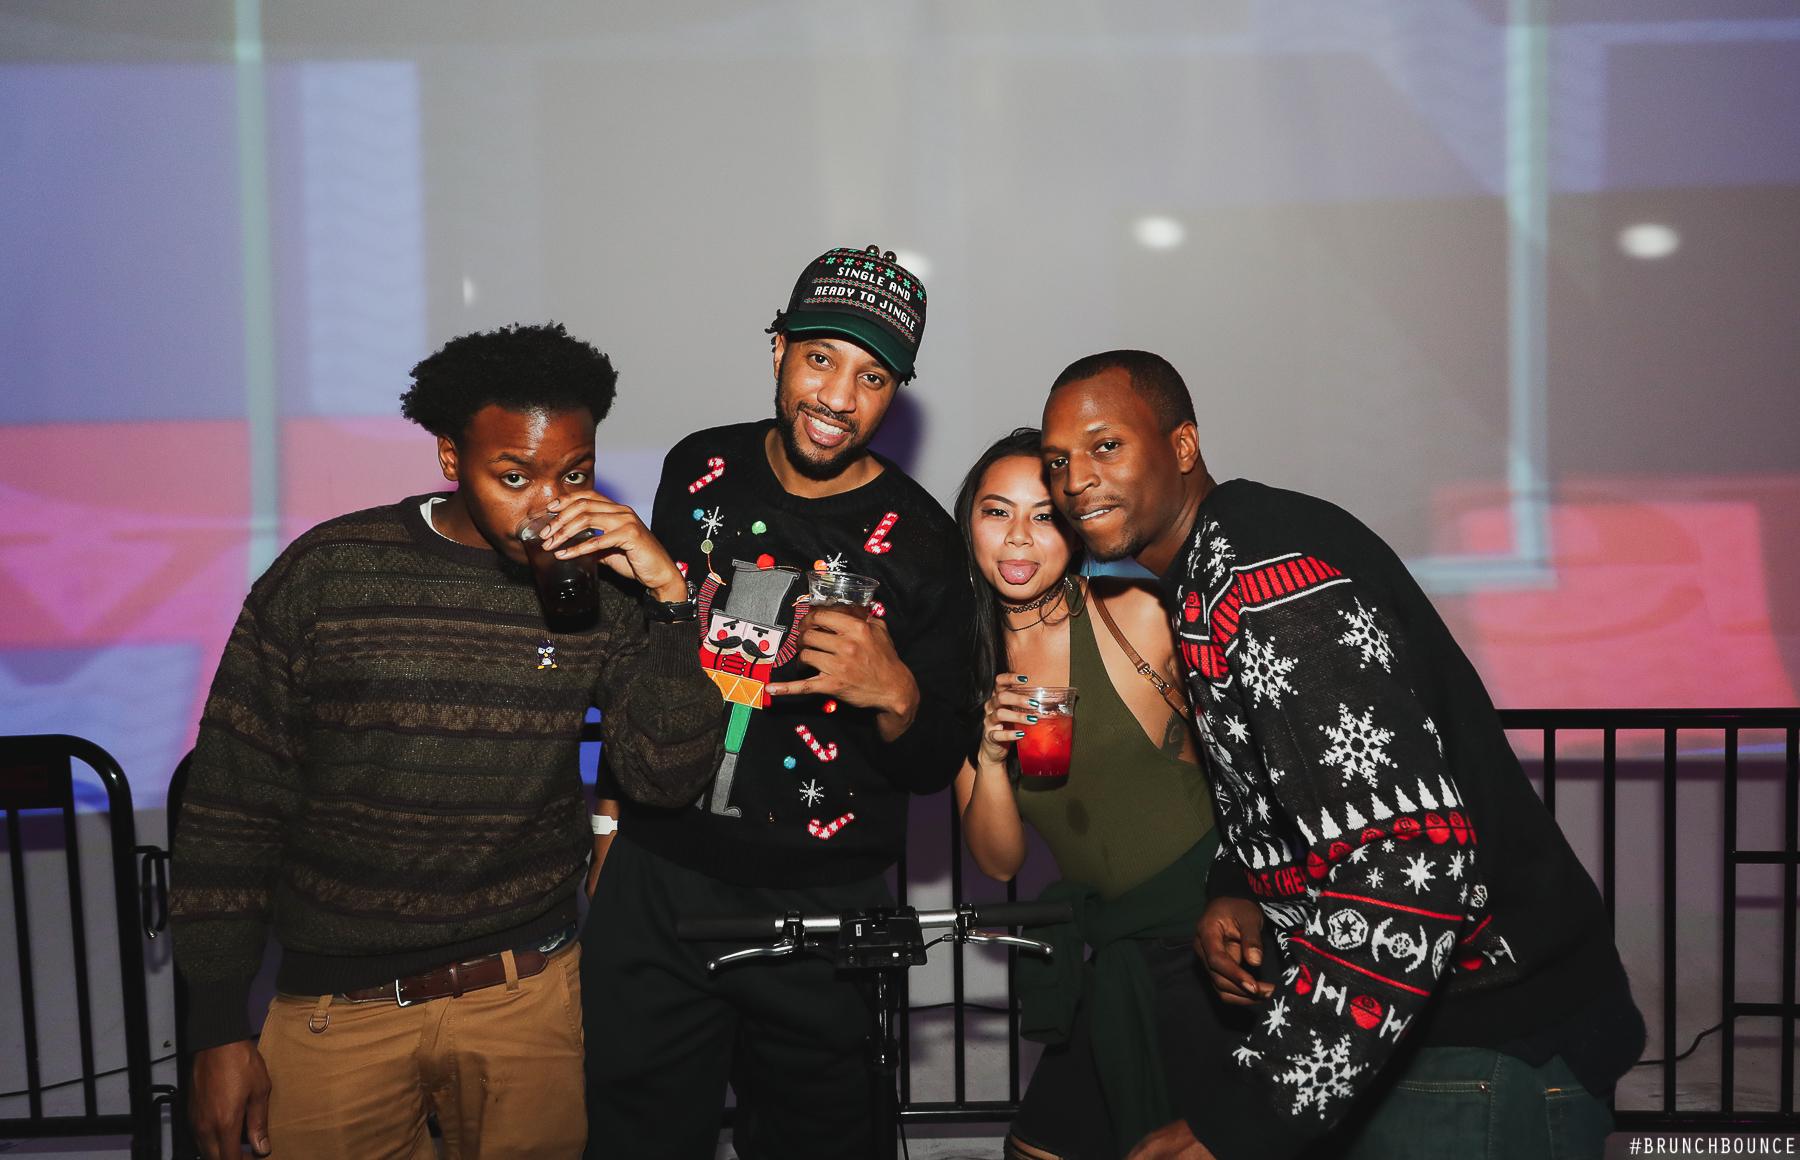 Brunch Bounce Ugly Sweater 2018-23.jpg